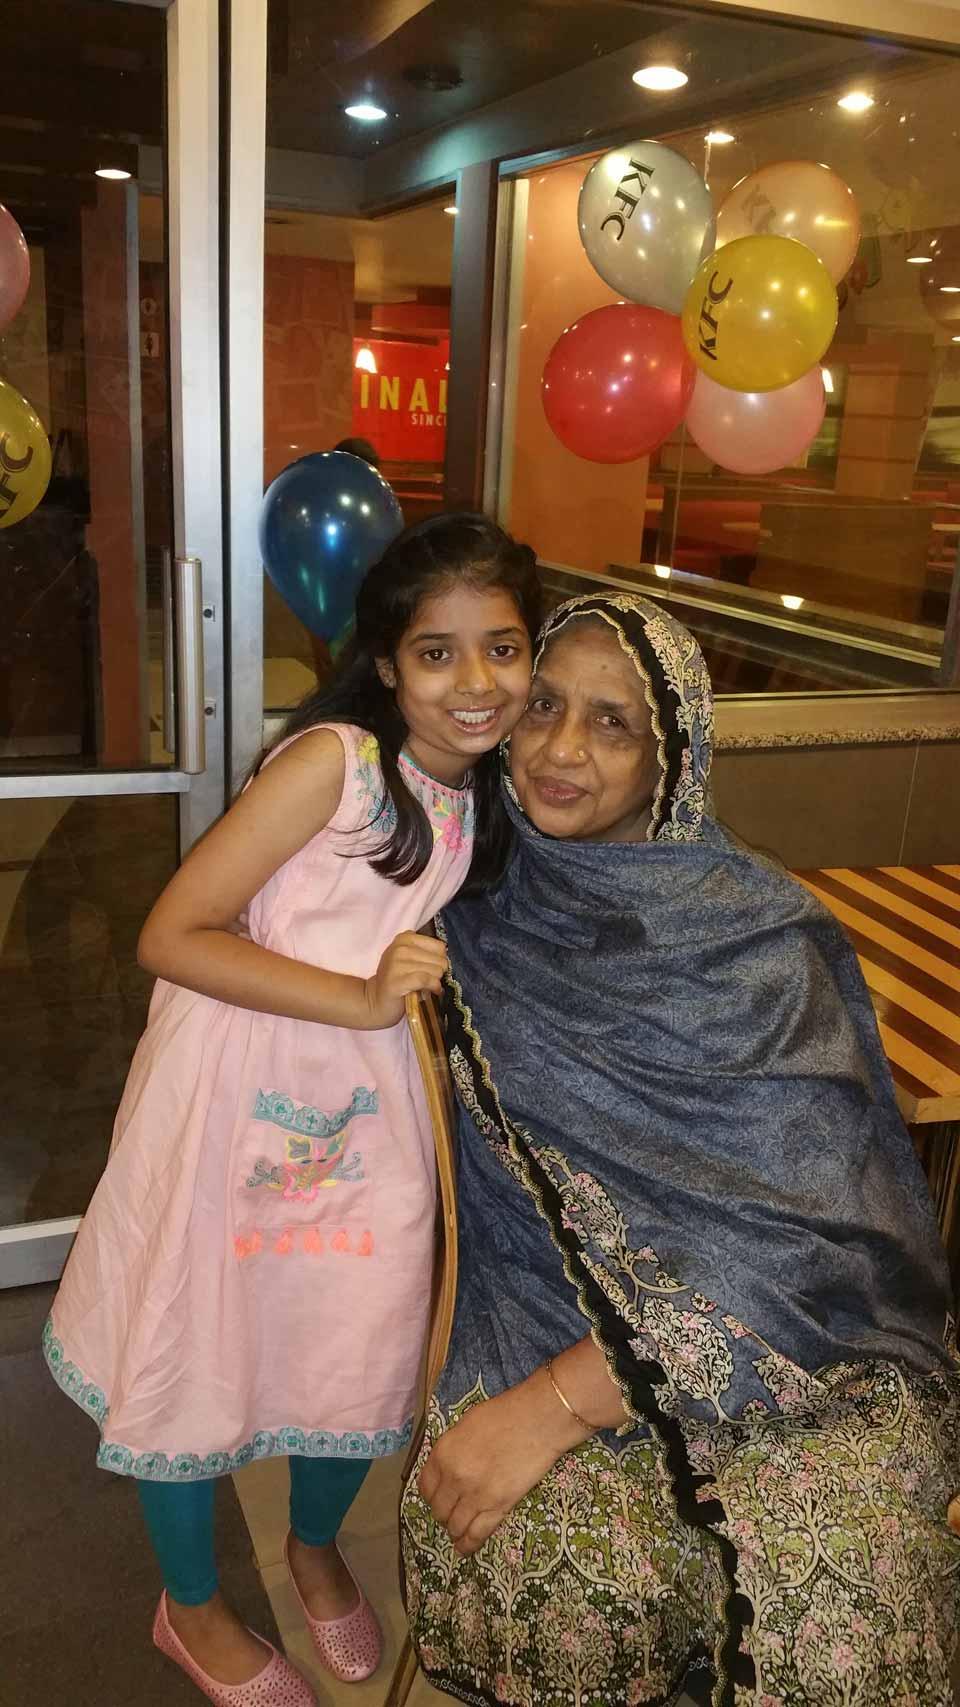 Zara with Rehana Nani from India who is visiting Mrs. Zohra Iqbal